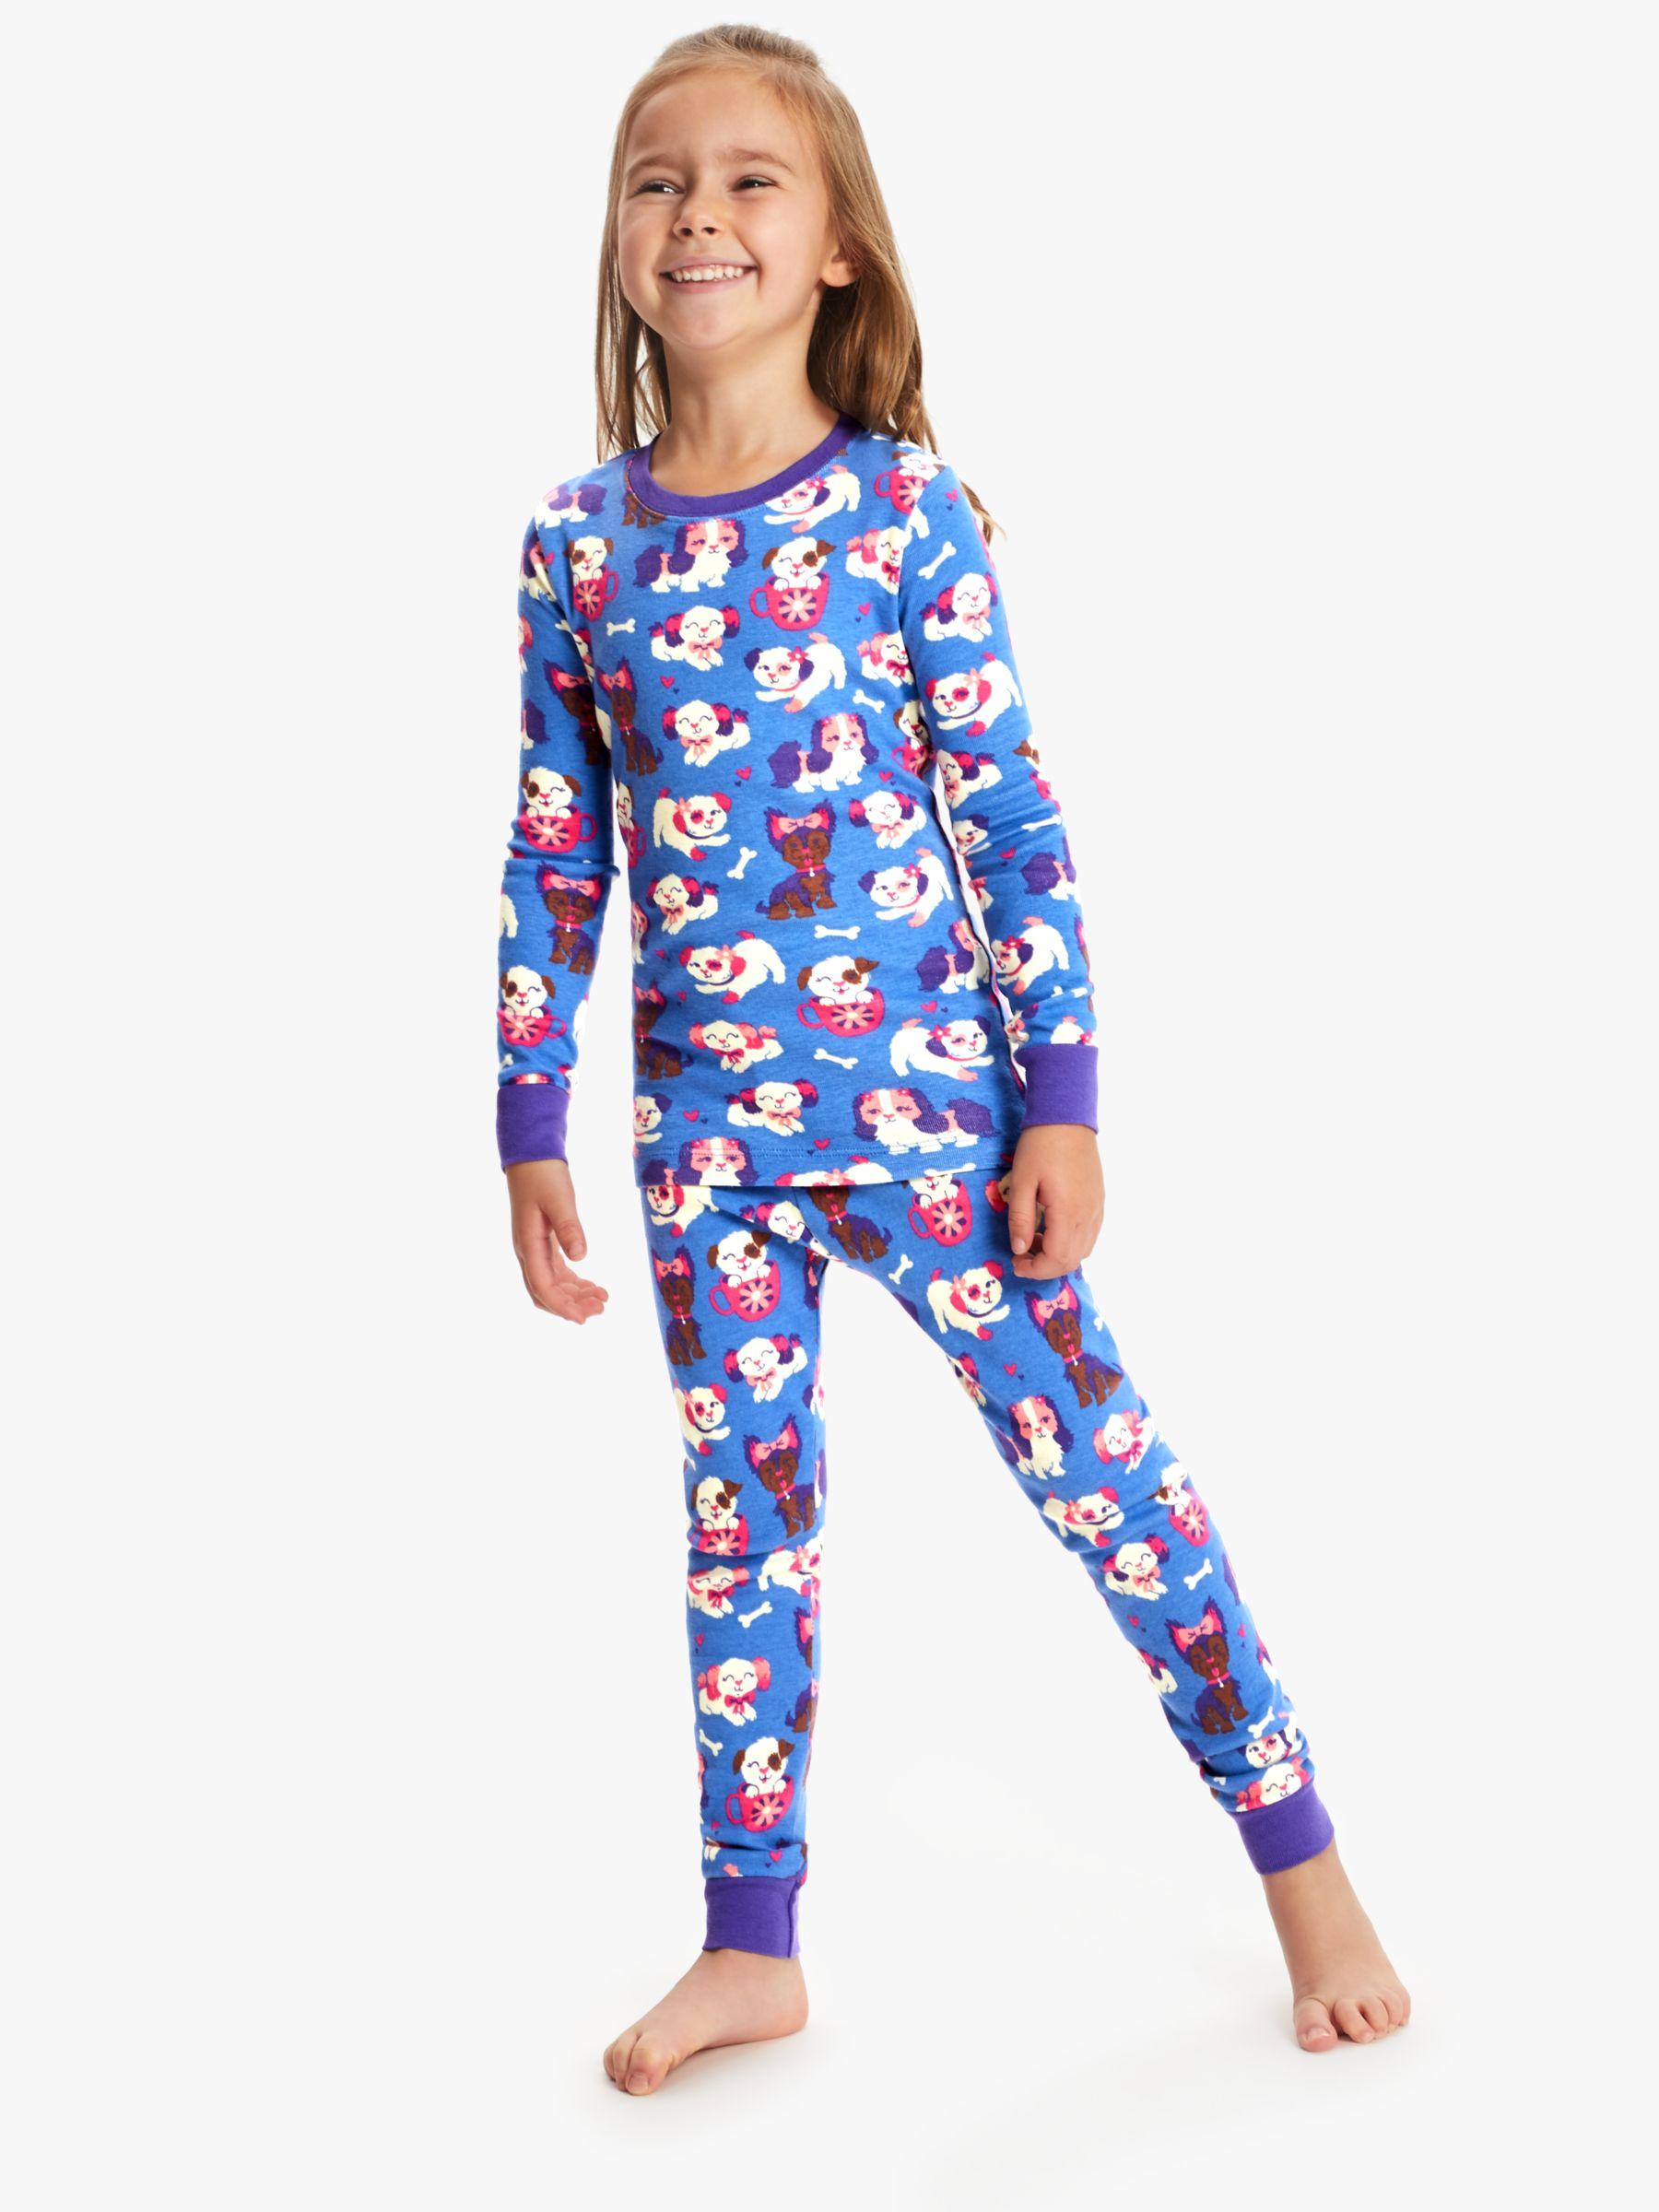 Hatley Hatley Girls' Puppy Love Pyjamas, Blue